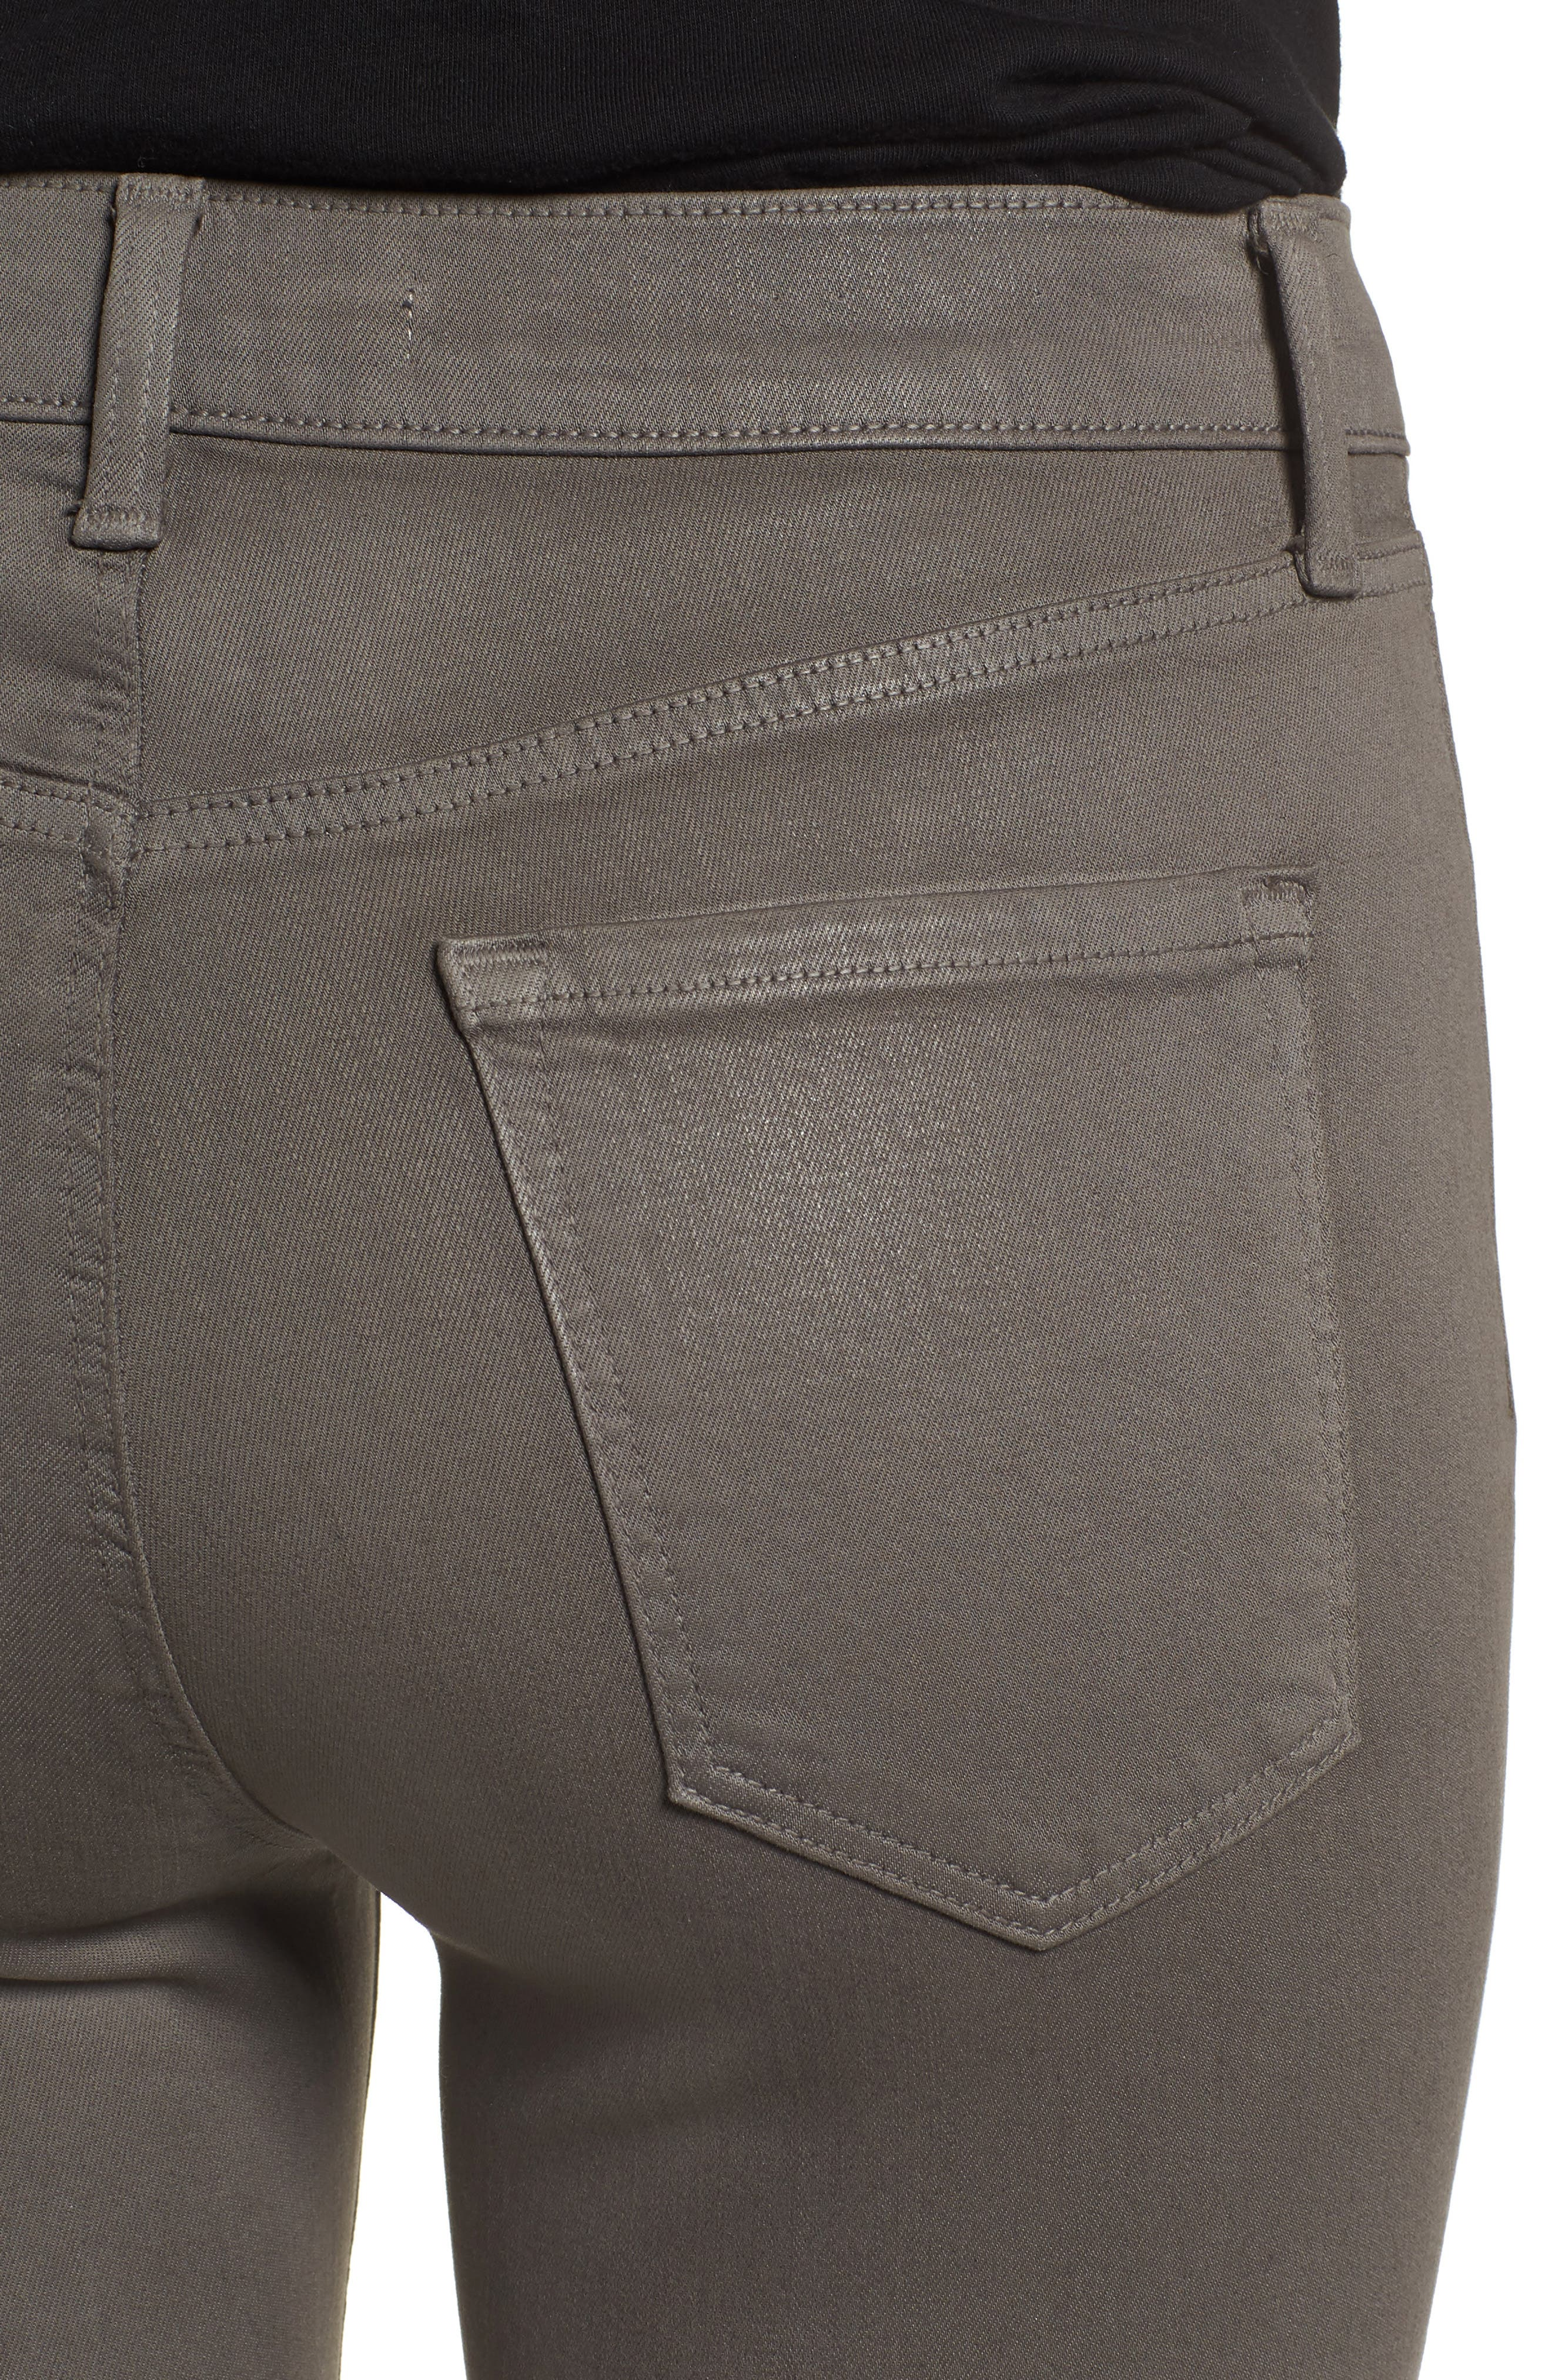 Alana High Waist Crop Skinny Jeans,                             Alternate thumbnail 4, color,                             COATED JUNIPER